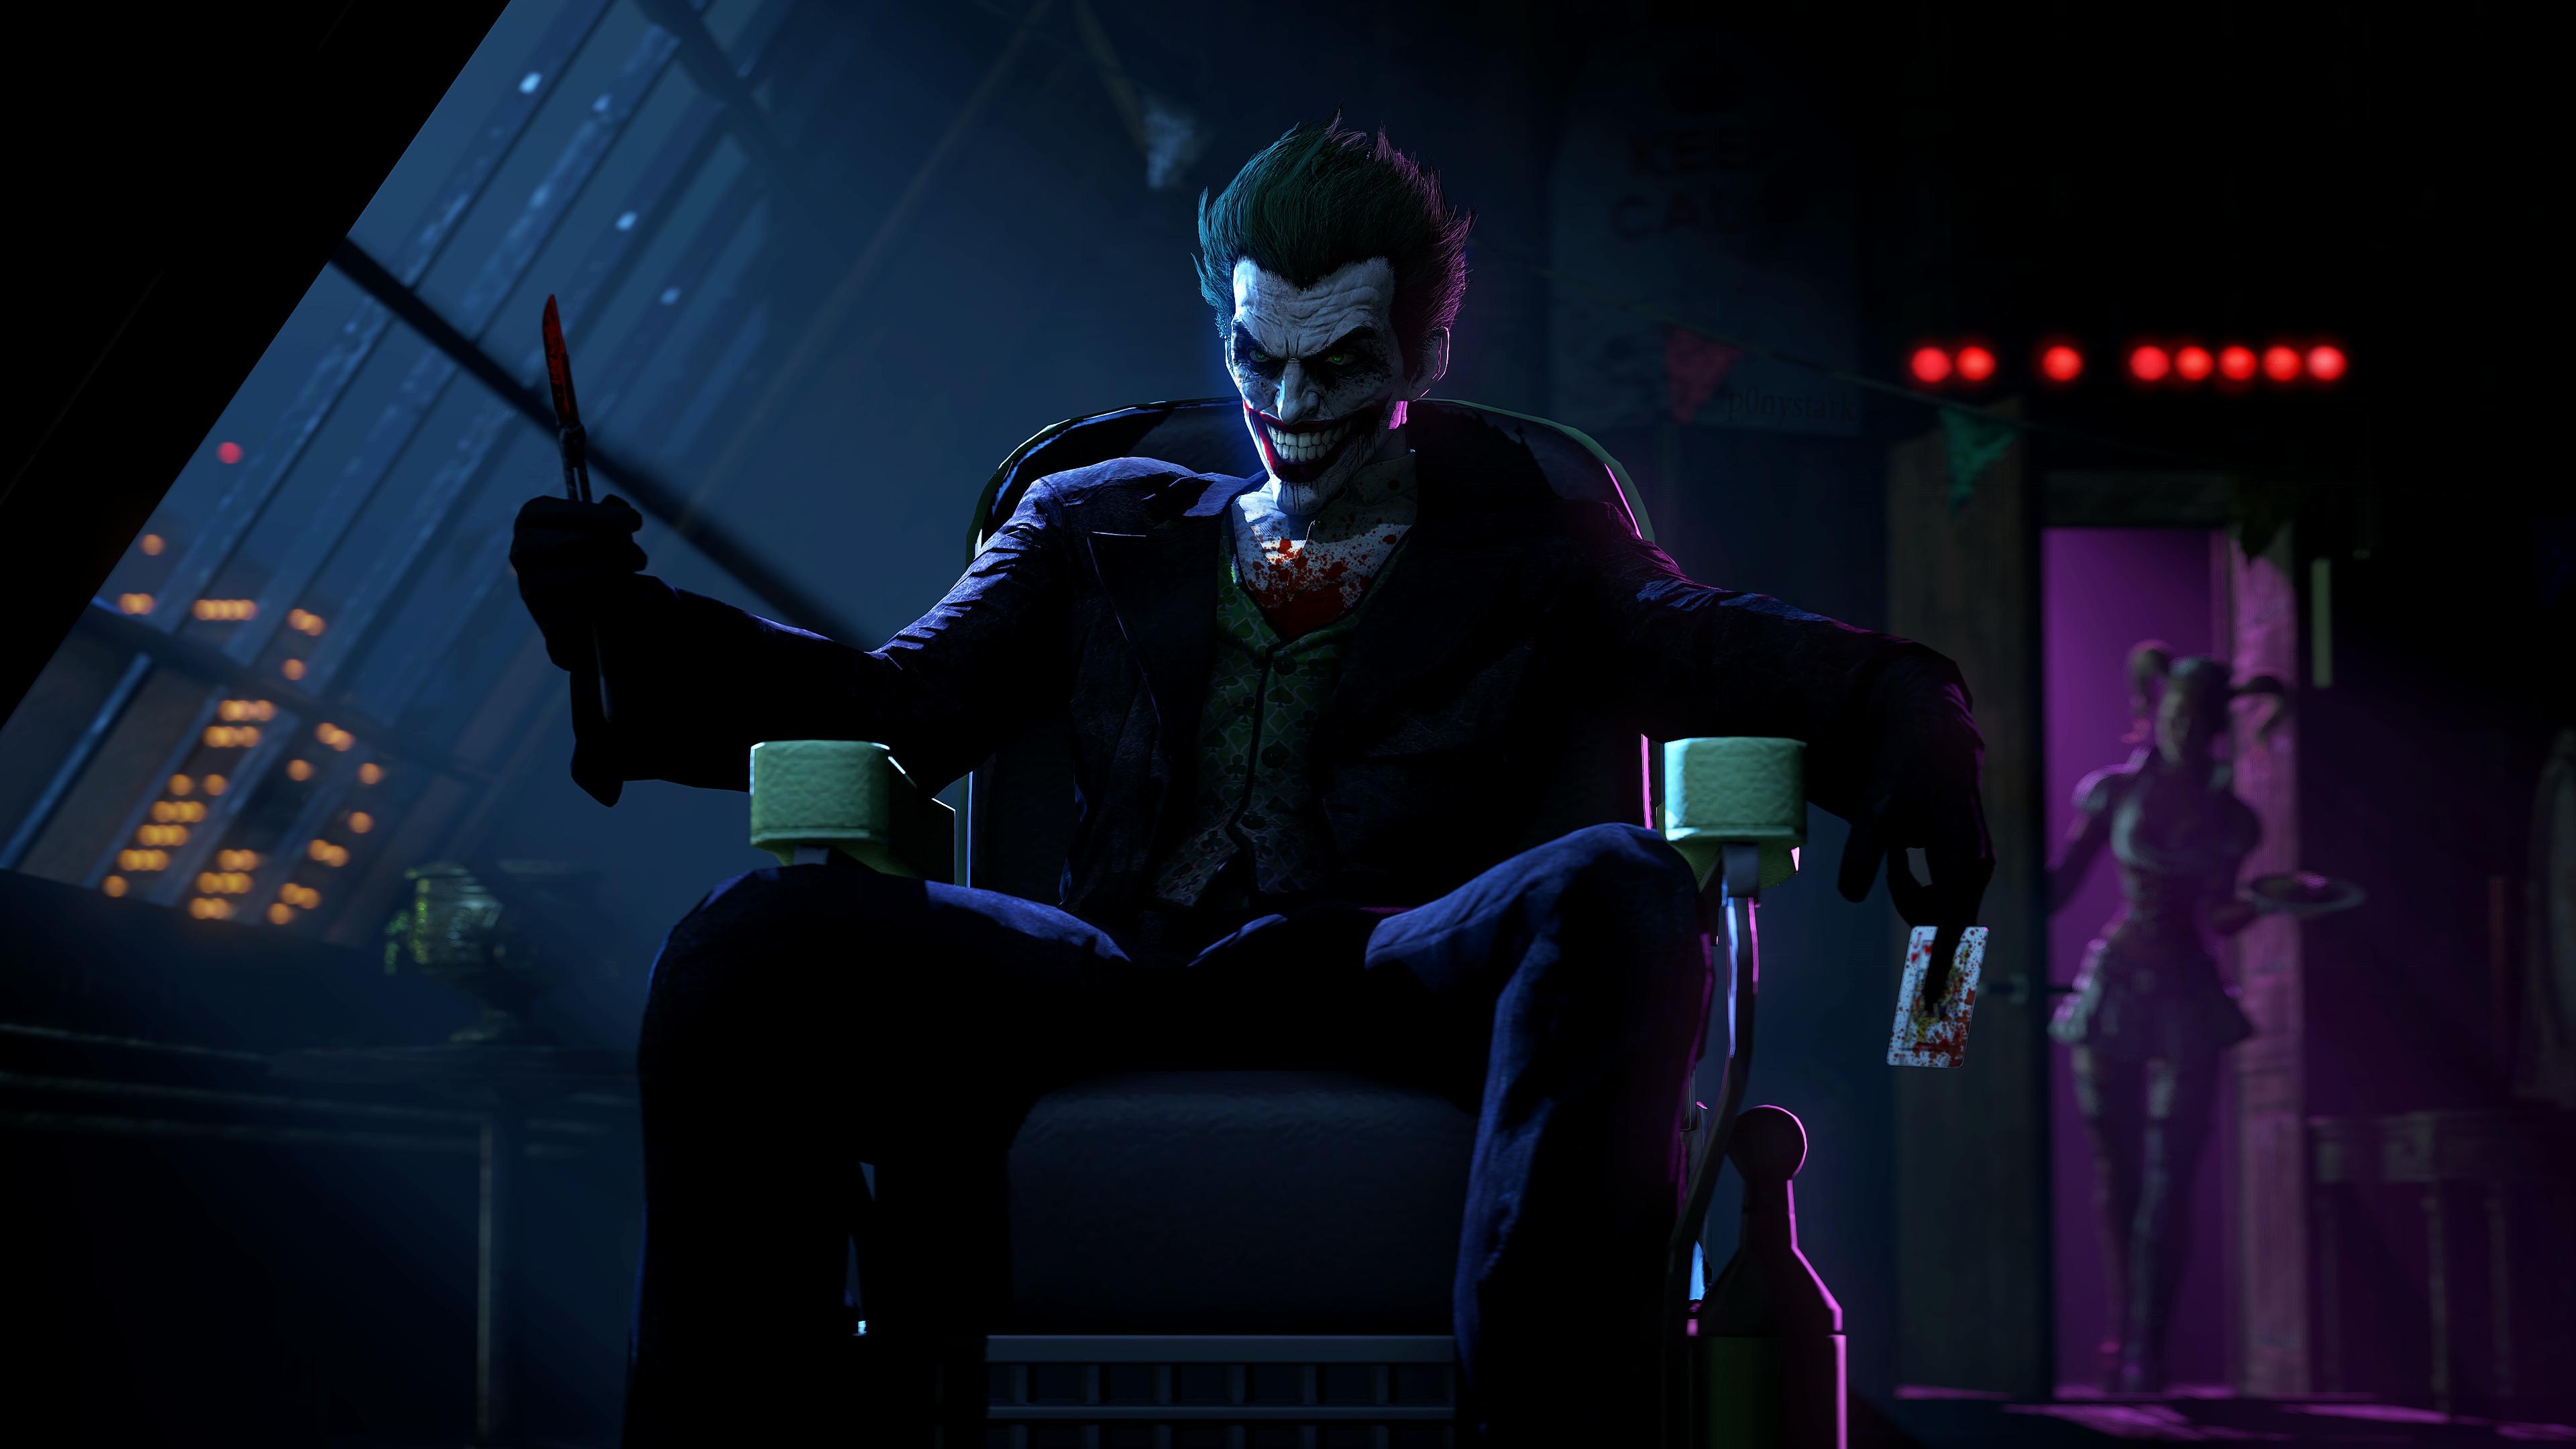 Joker in batman arkham origins hd games 4k wallpapers for Joker wallpaper 4k